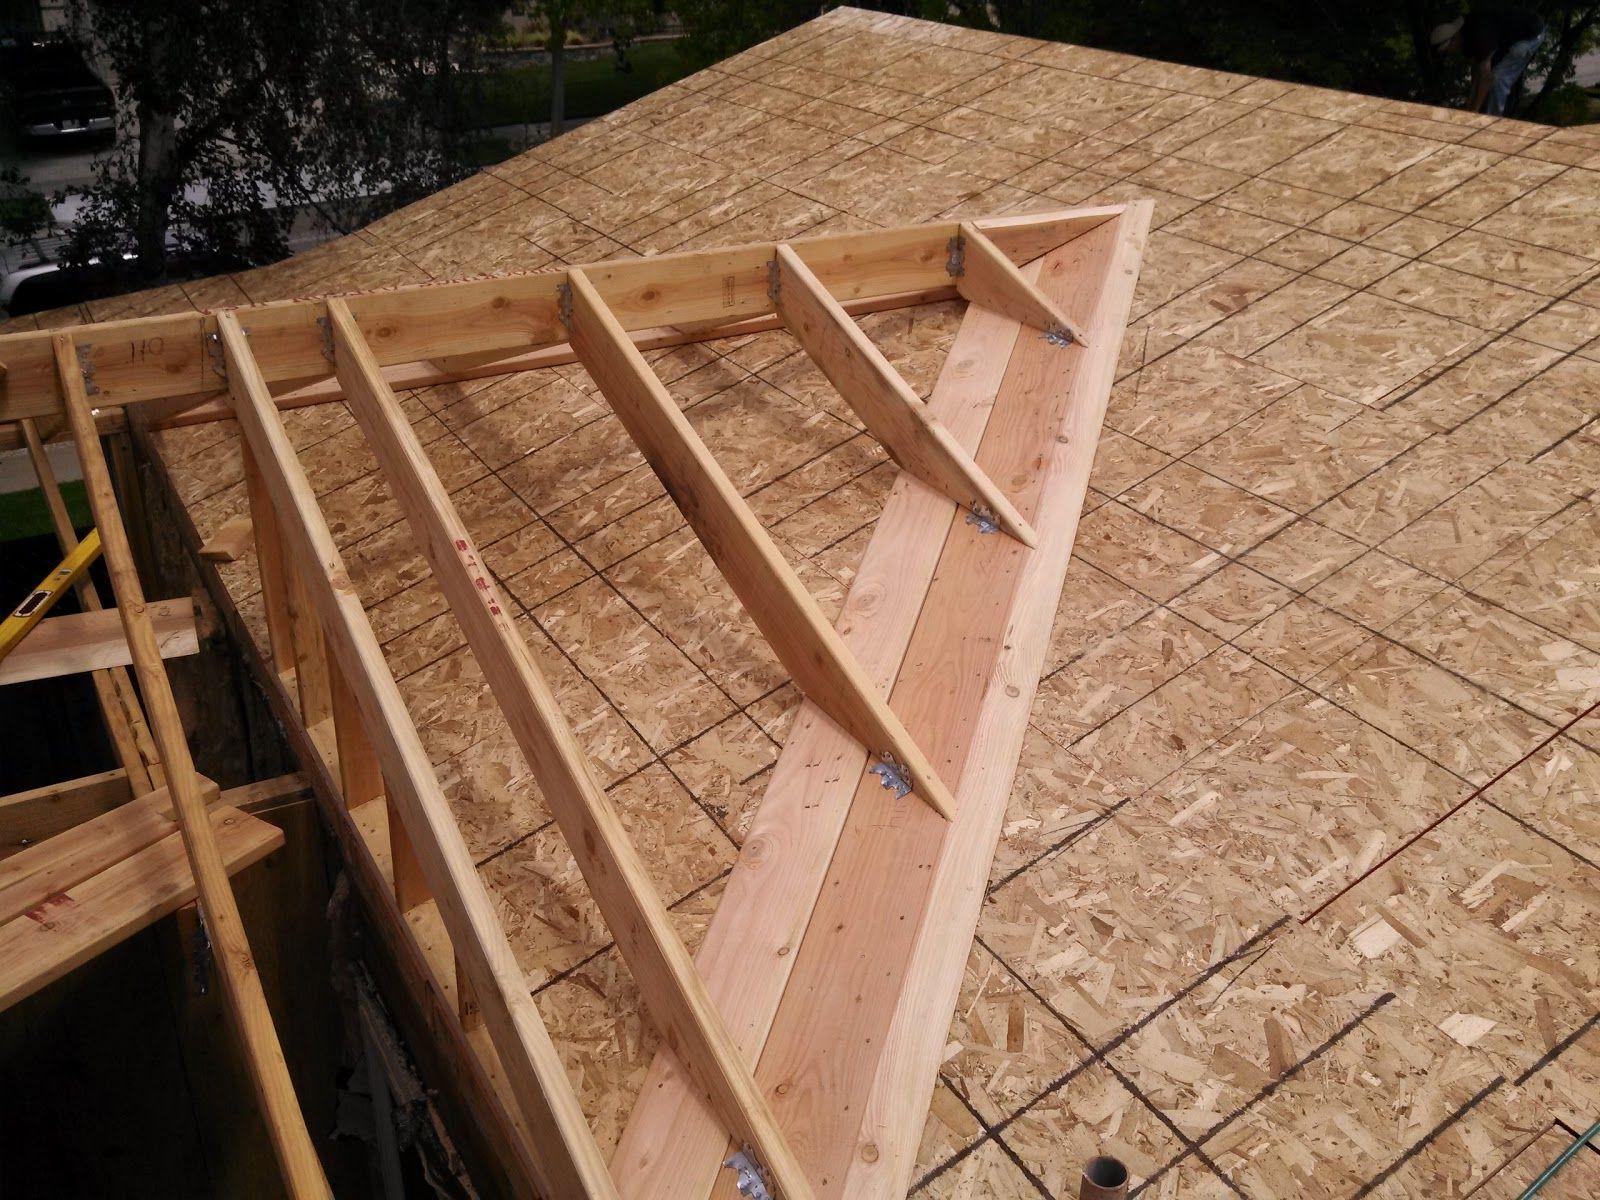 Bevel Angle Porch Design Building A Porch Framing Construction